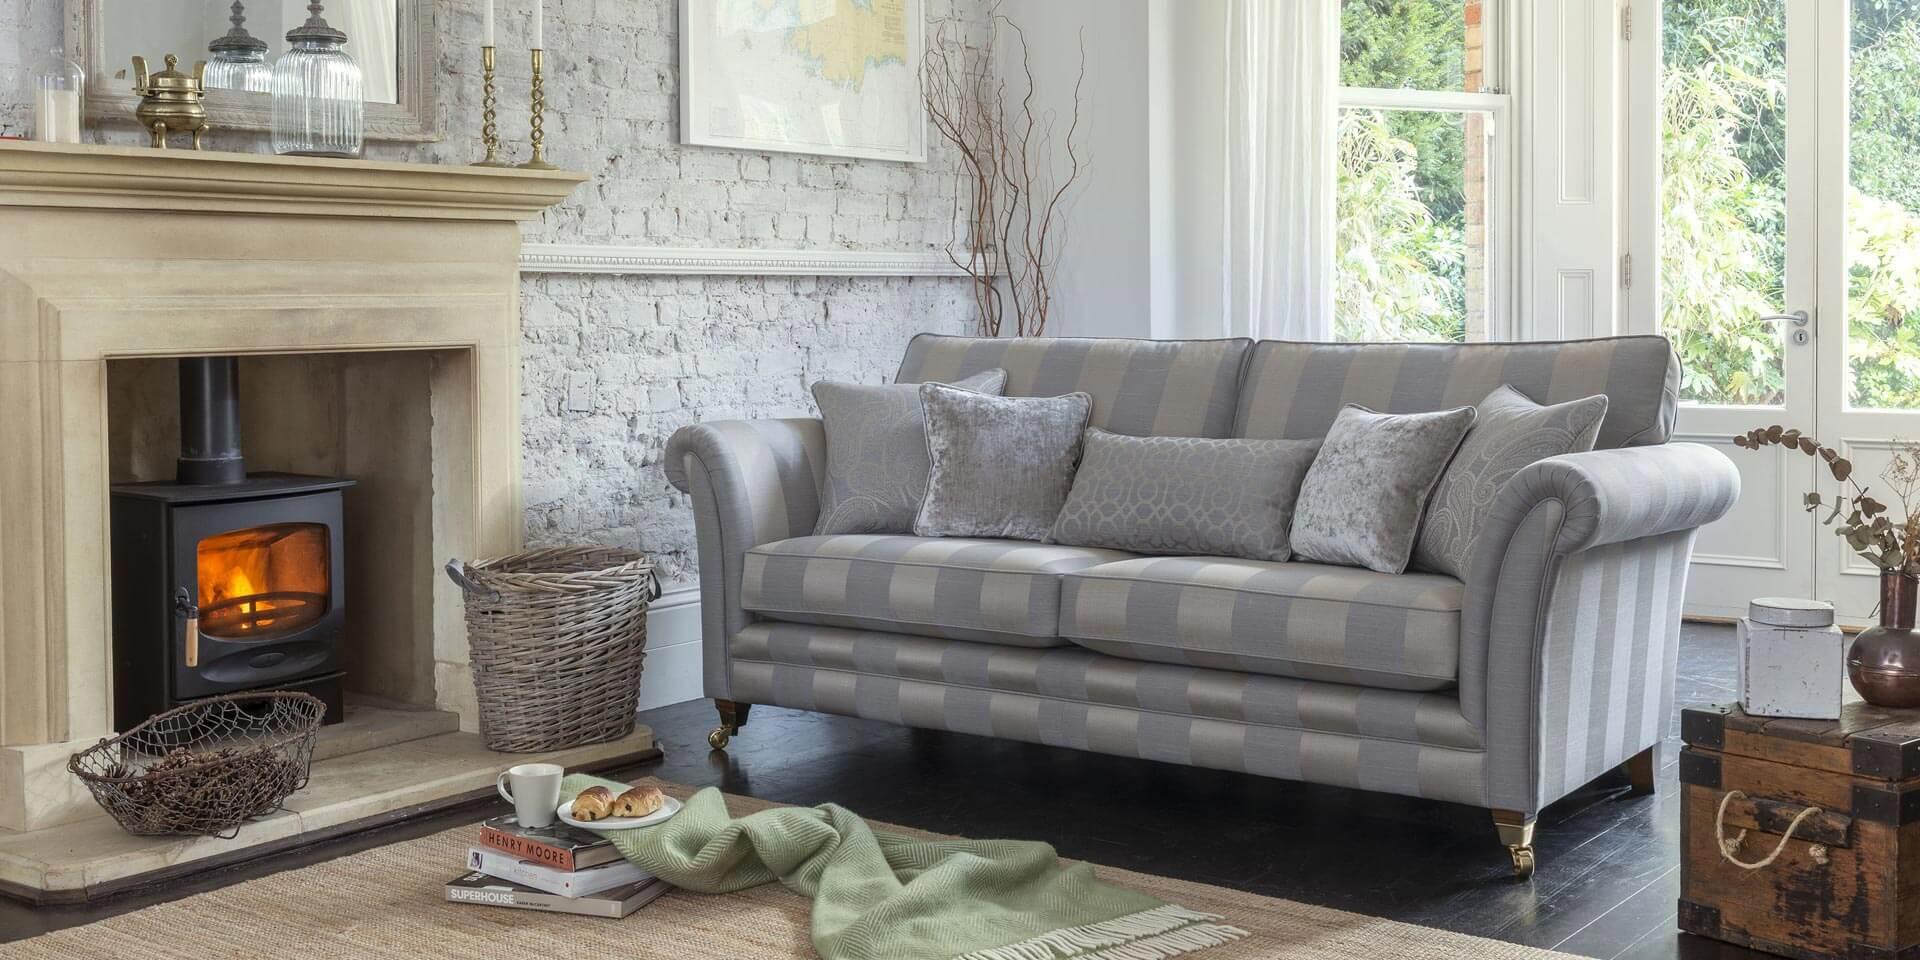 hussen fur sofa blau, alstons - sofas for living, Design ideen